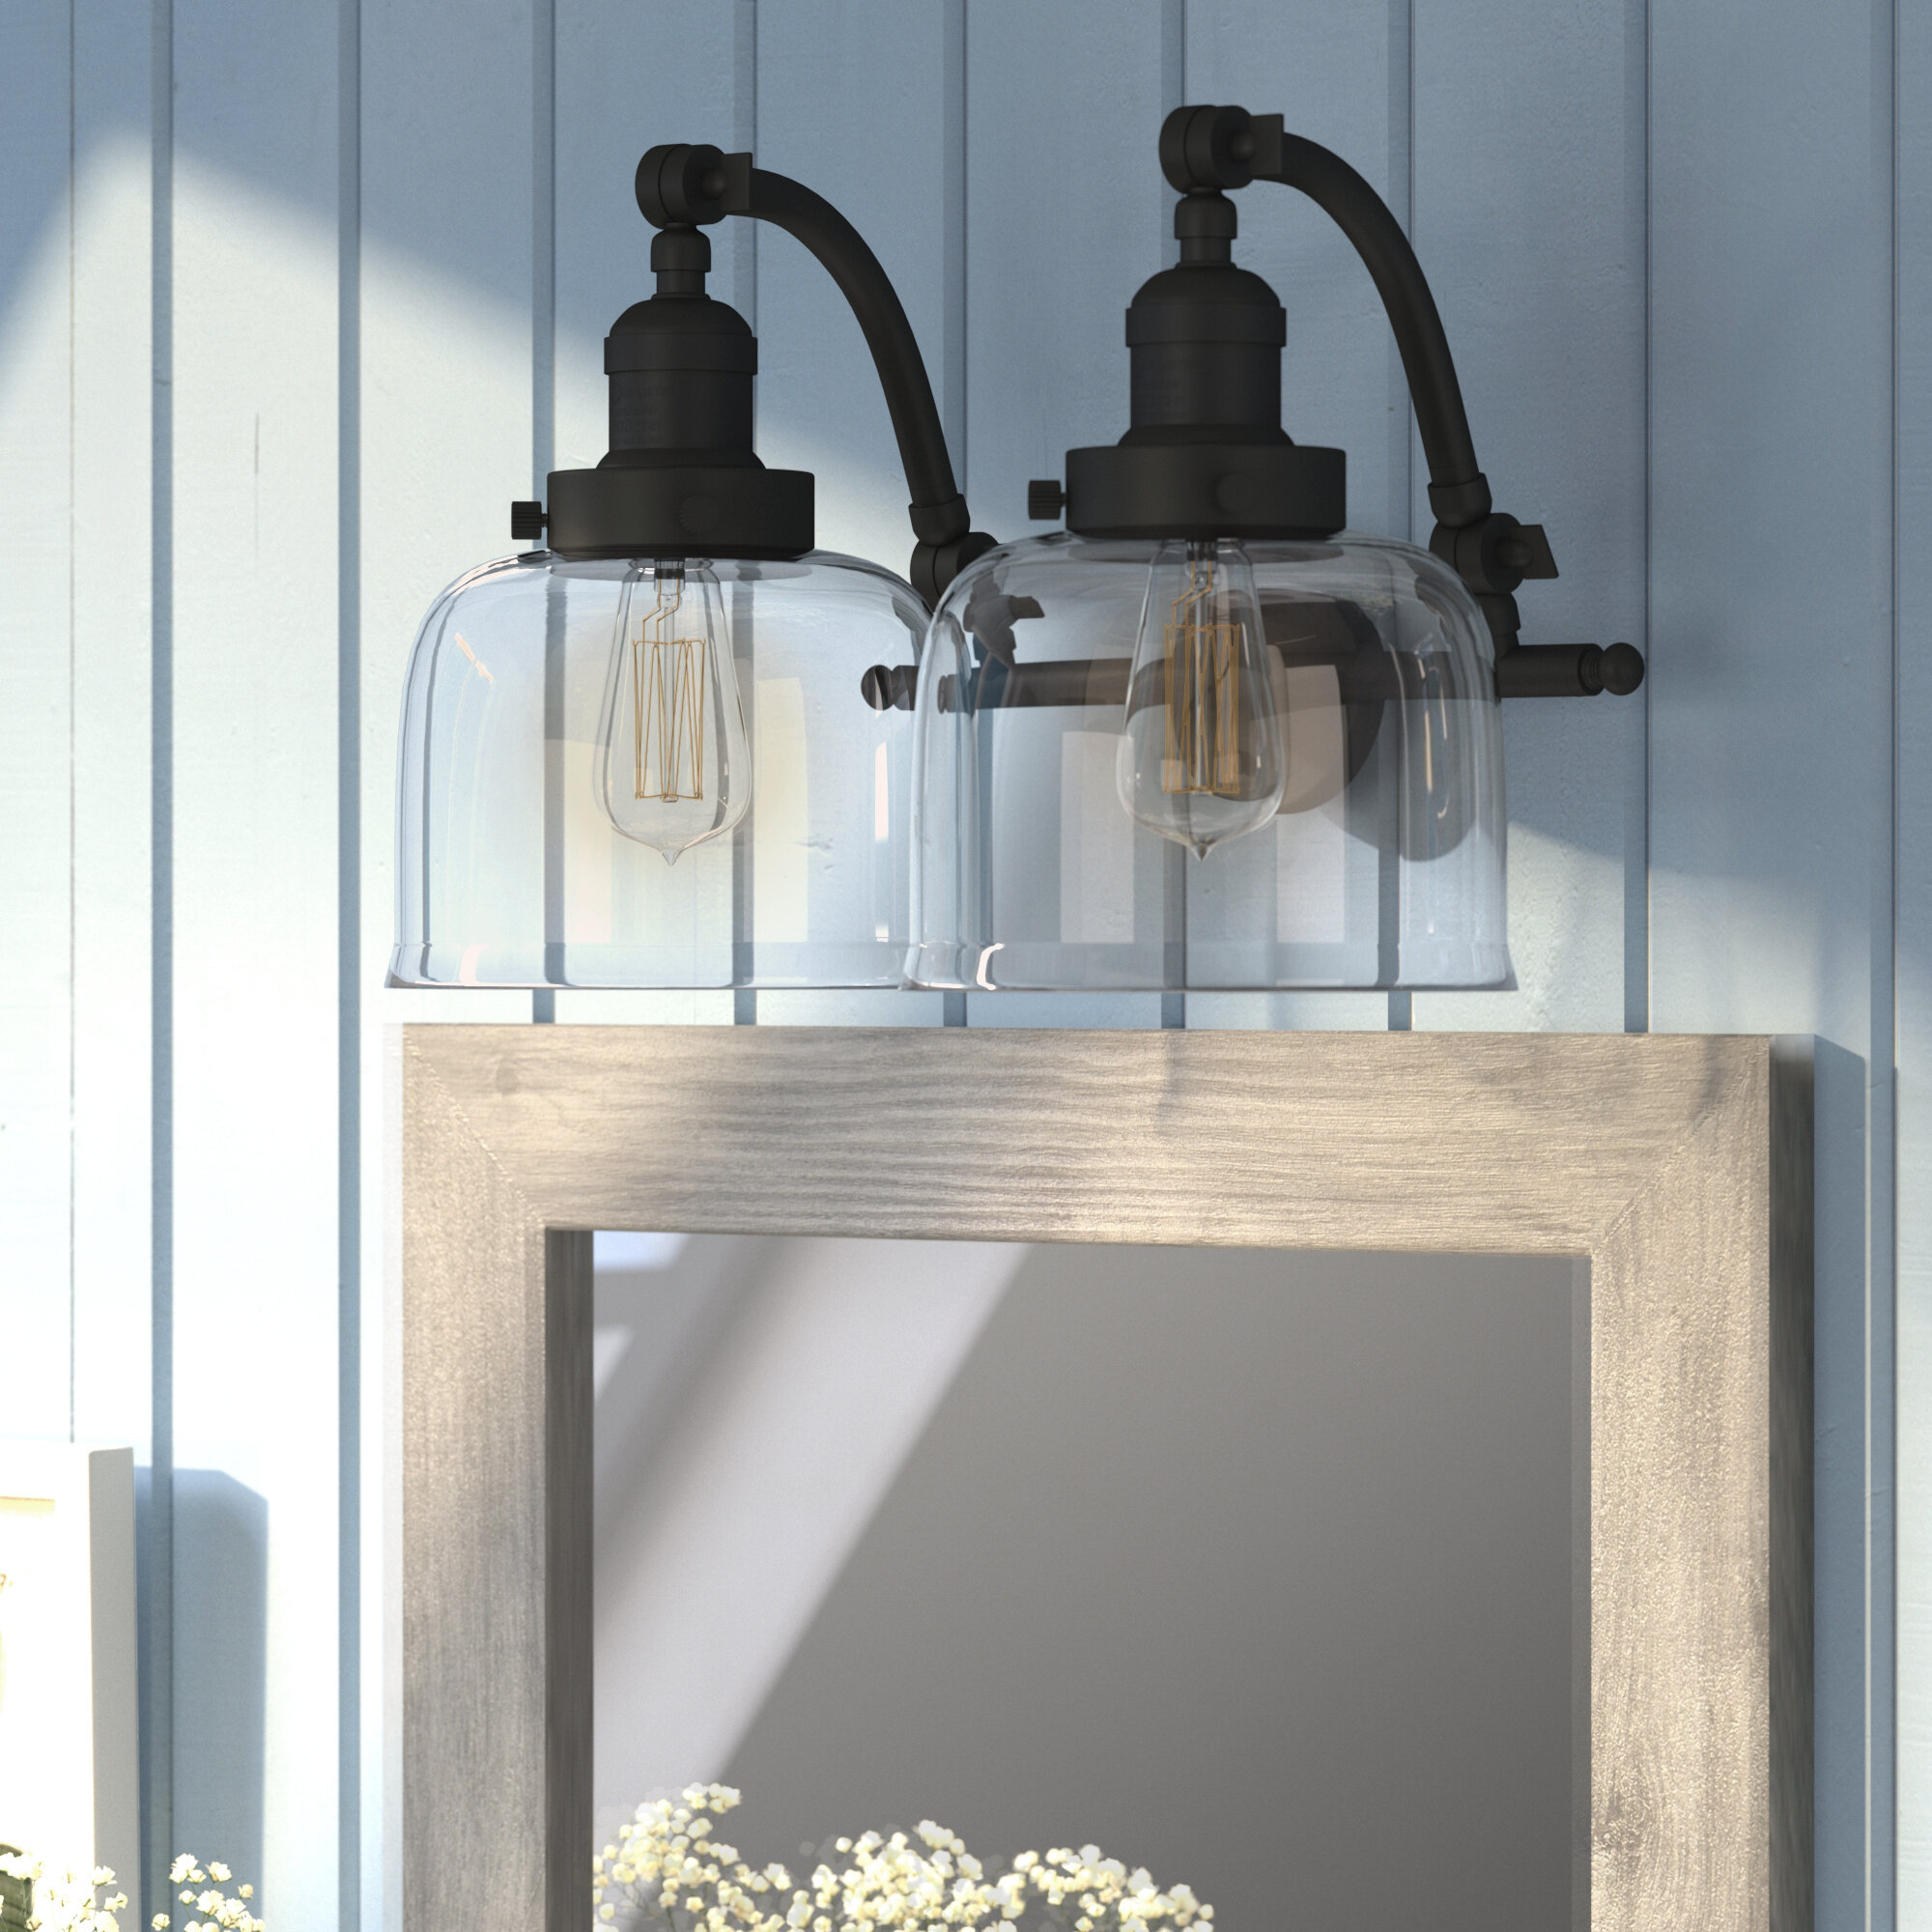 Williston Forge Burlingame 2 Light Dimmable Vanity Light Reviews Wayfair